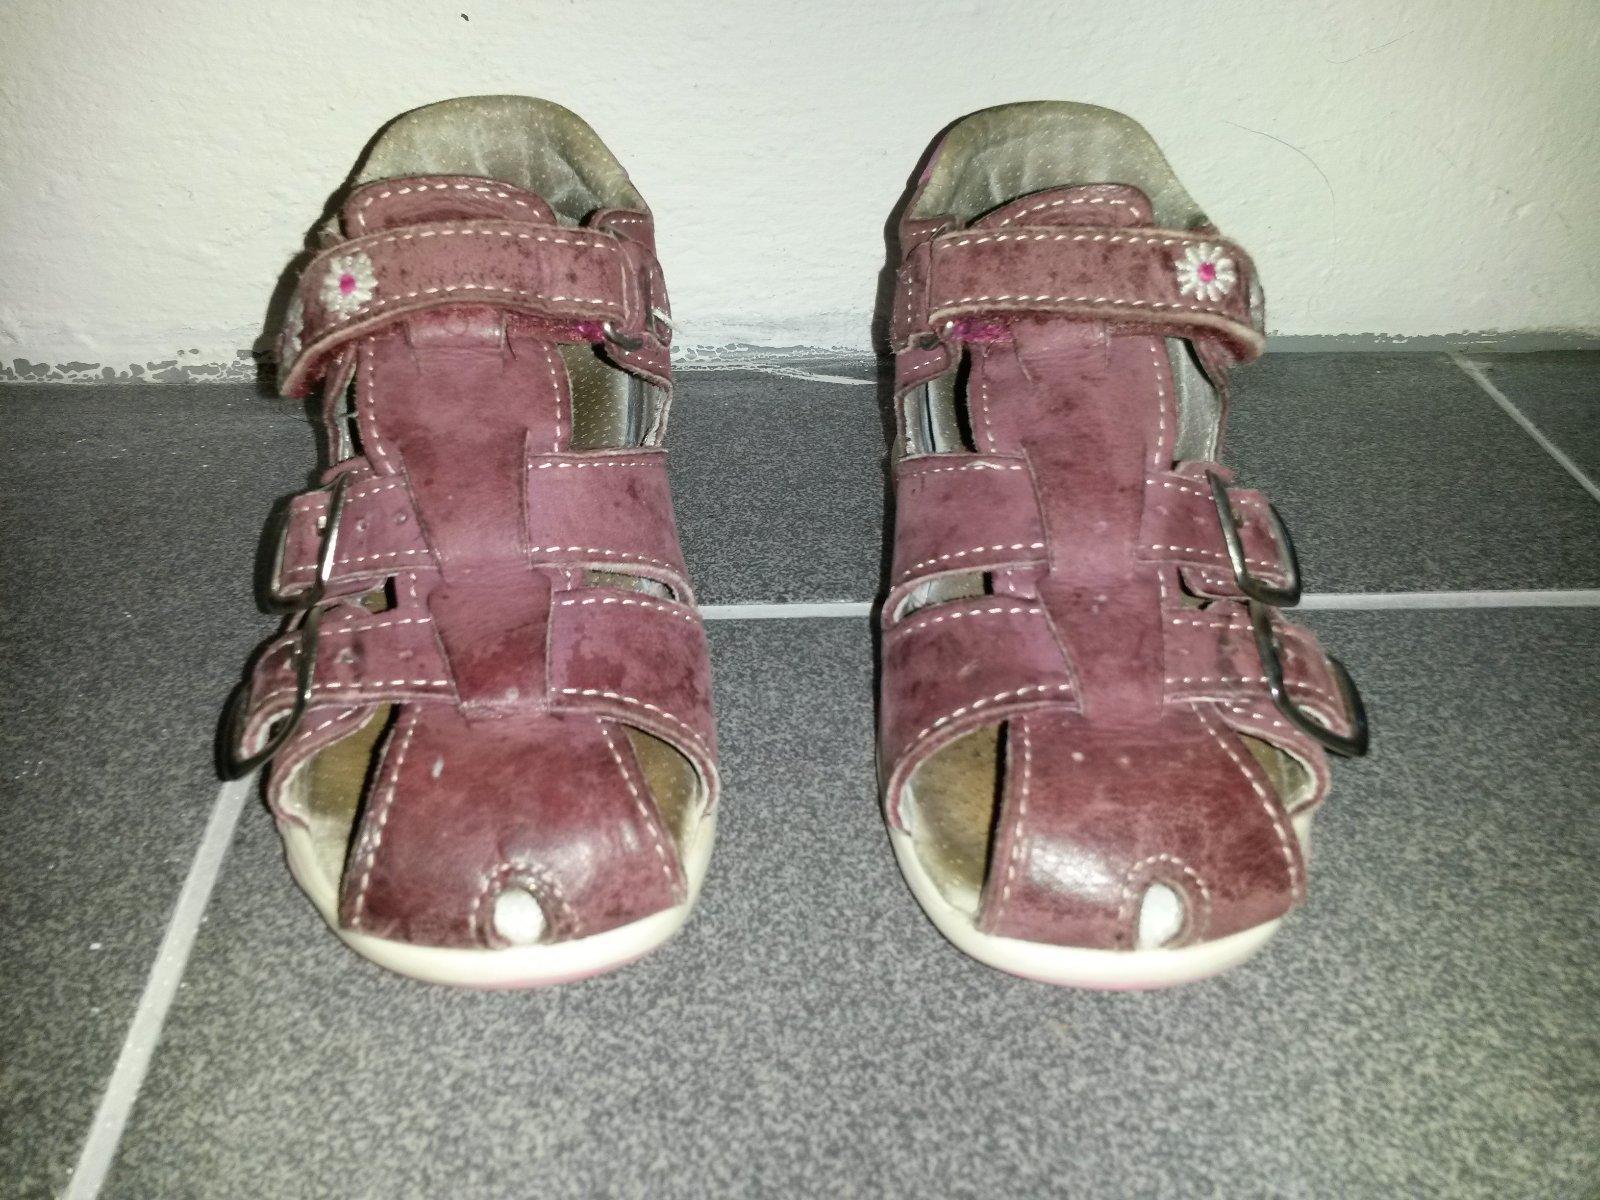 0a0a1ebf2e1 Sandálky jonap vel. 25